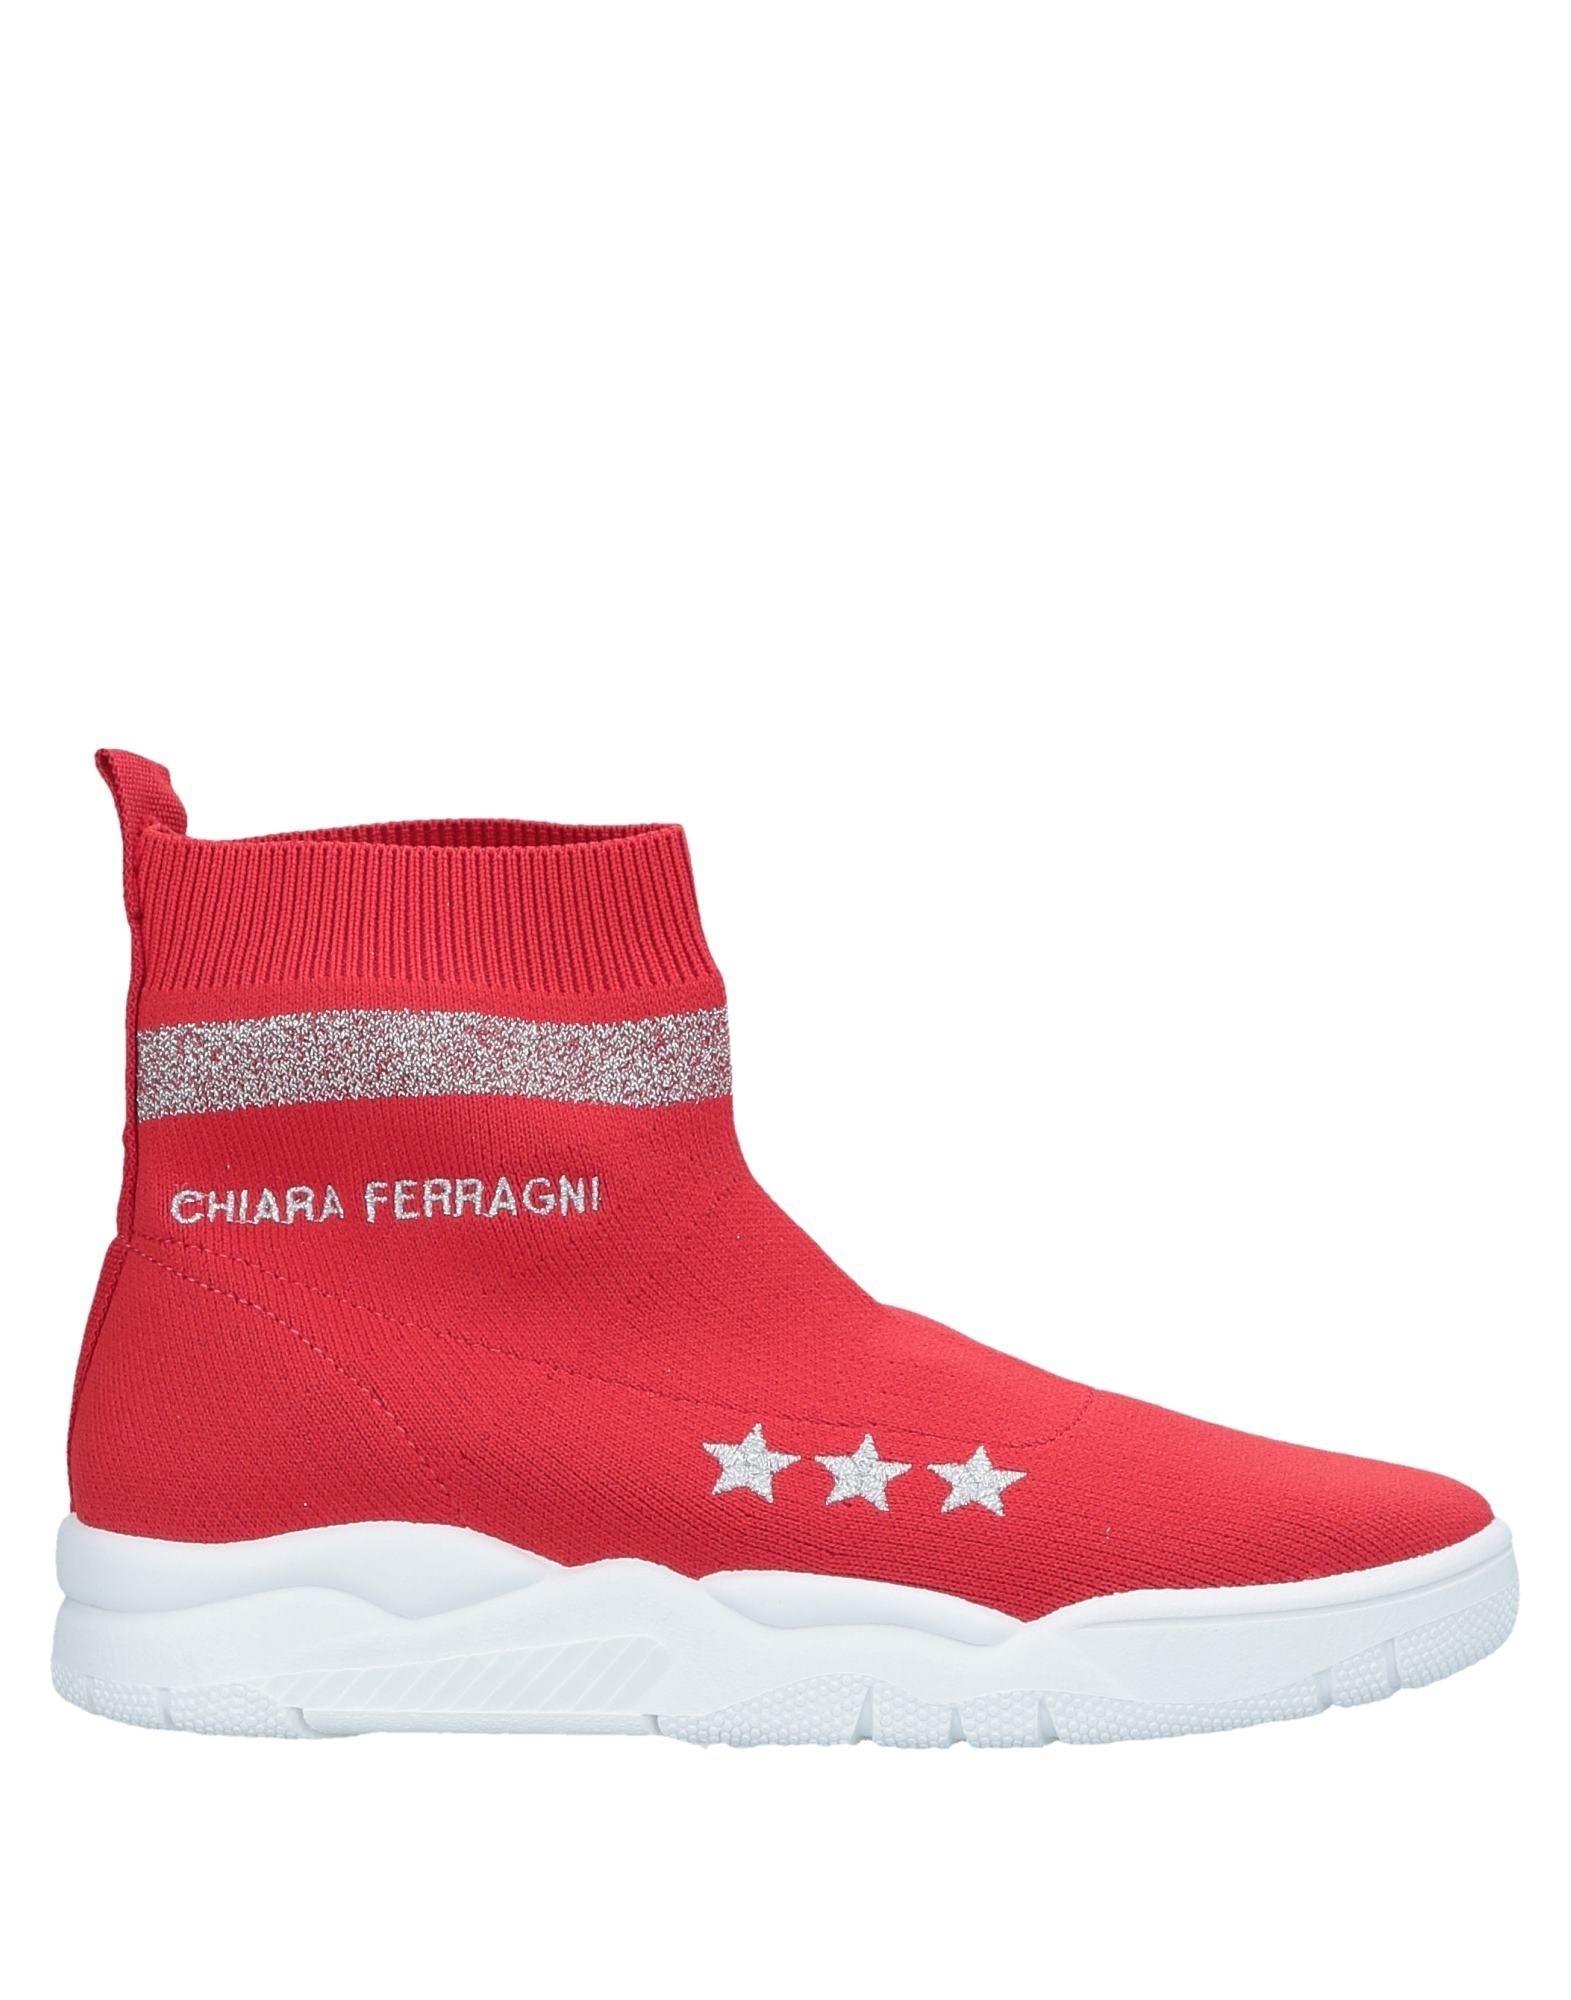 Chiara Ferragni Sneakers Schuhe Damen  11531004KD Neue Schuhe Sneakers 0c4591